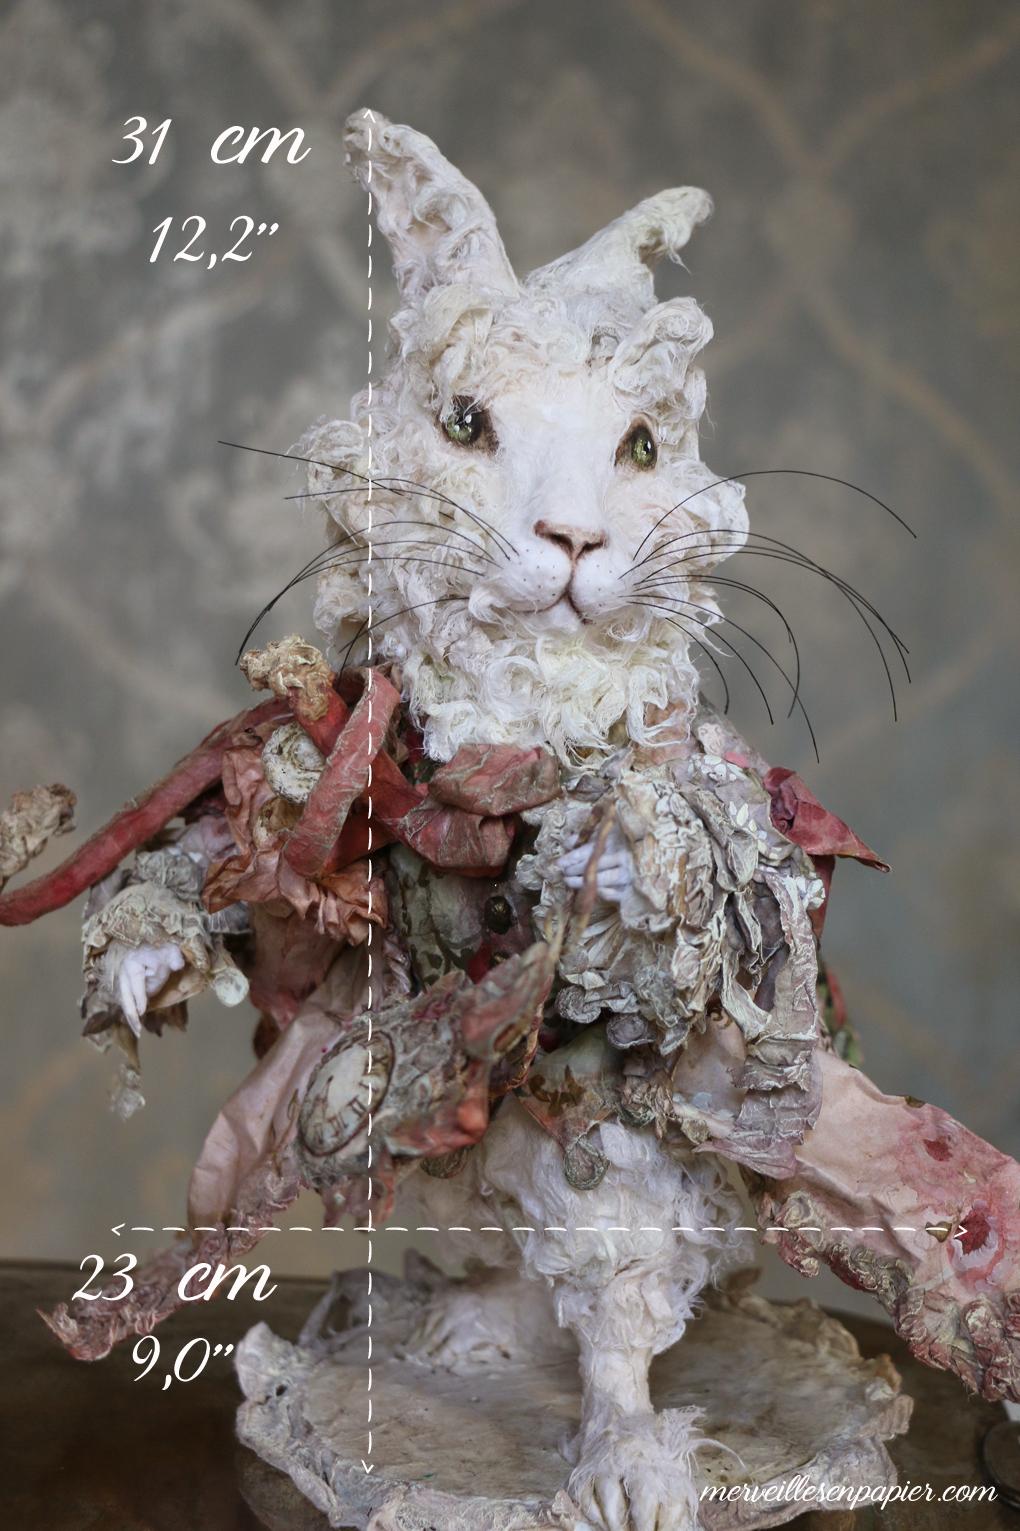 rabbit-measurements.jpg